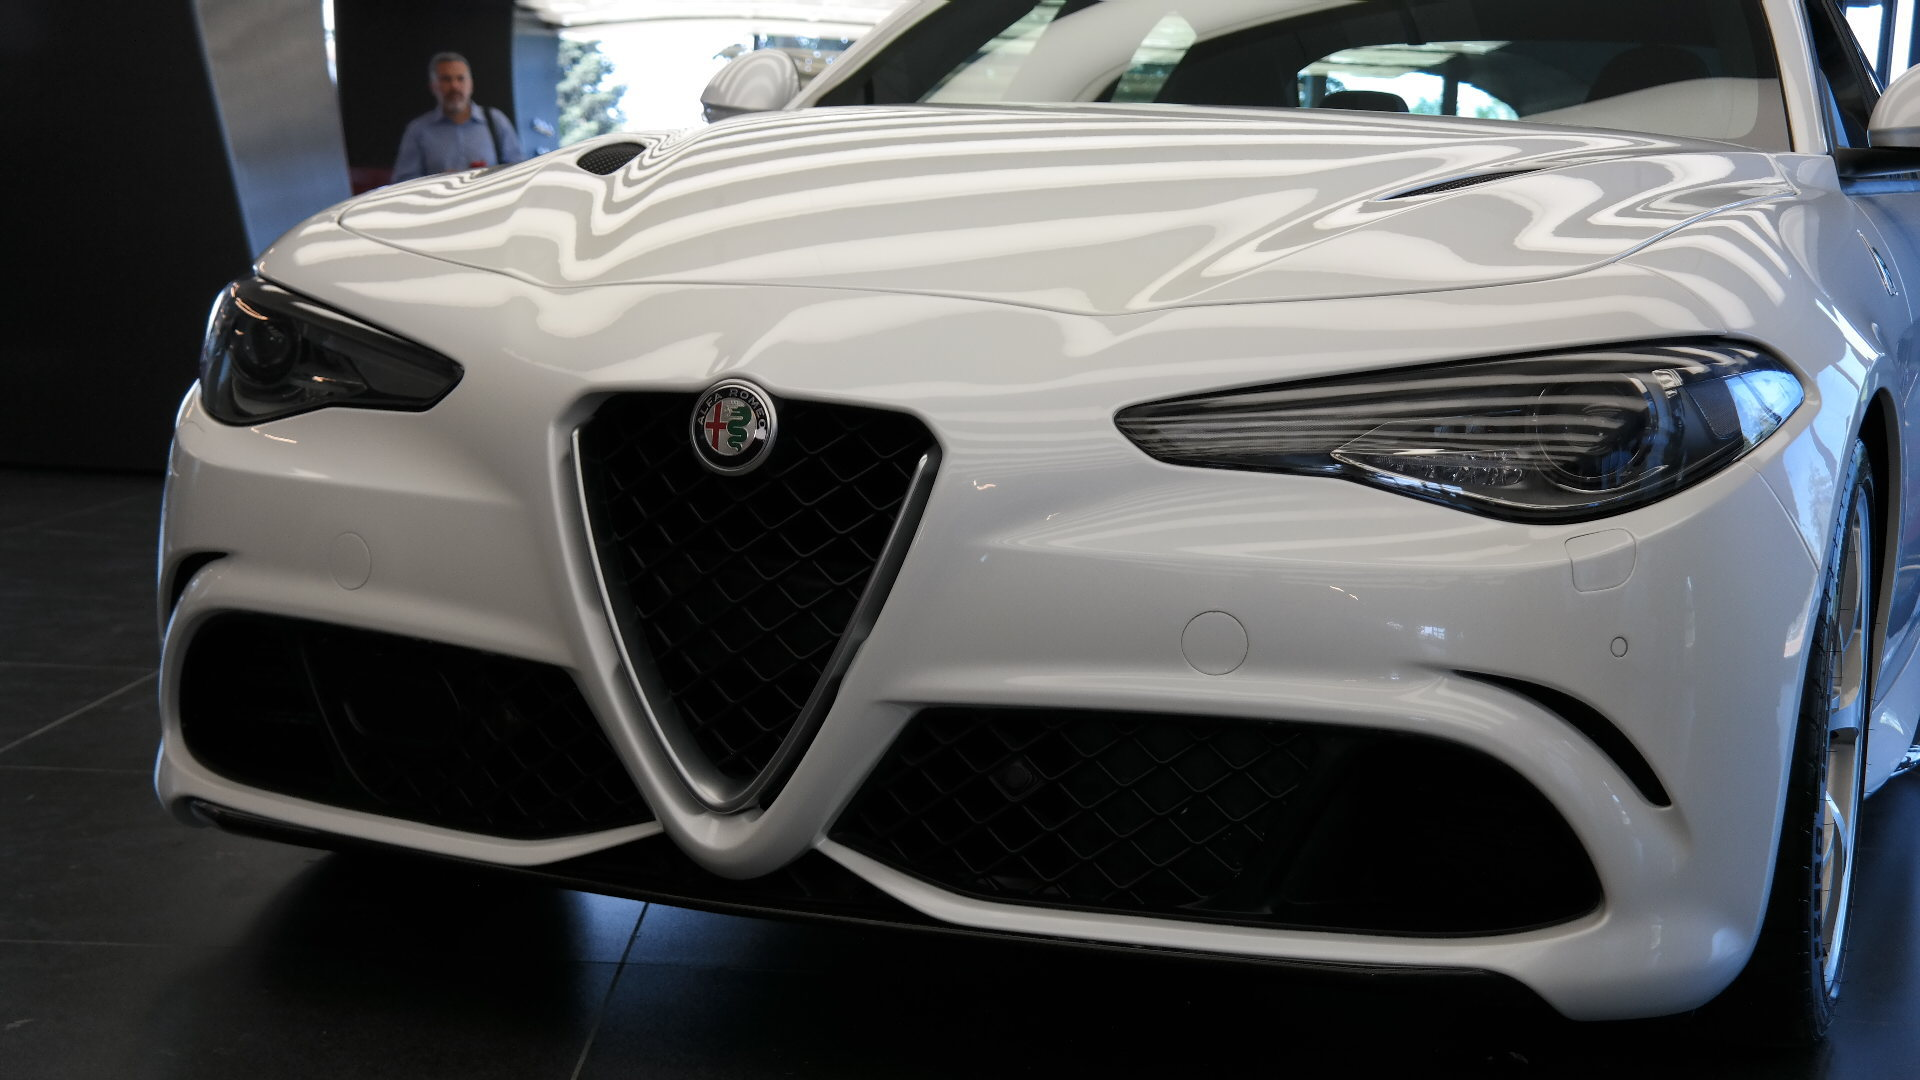 Alfa Romeo Giulia 2015 Wallpapers HD